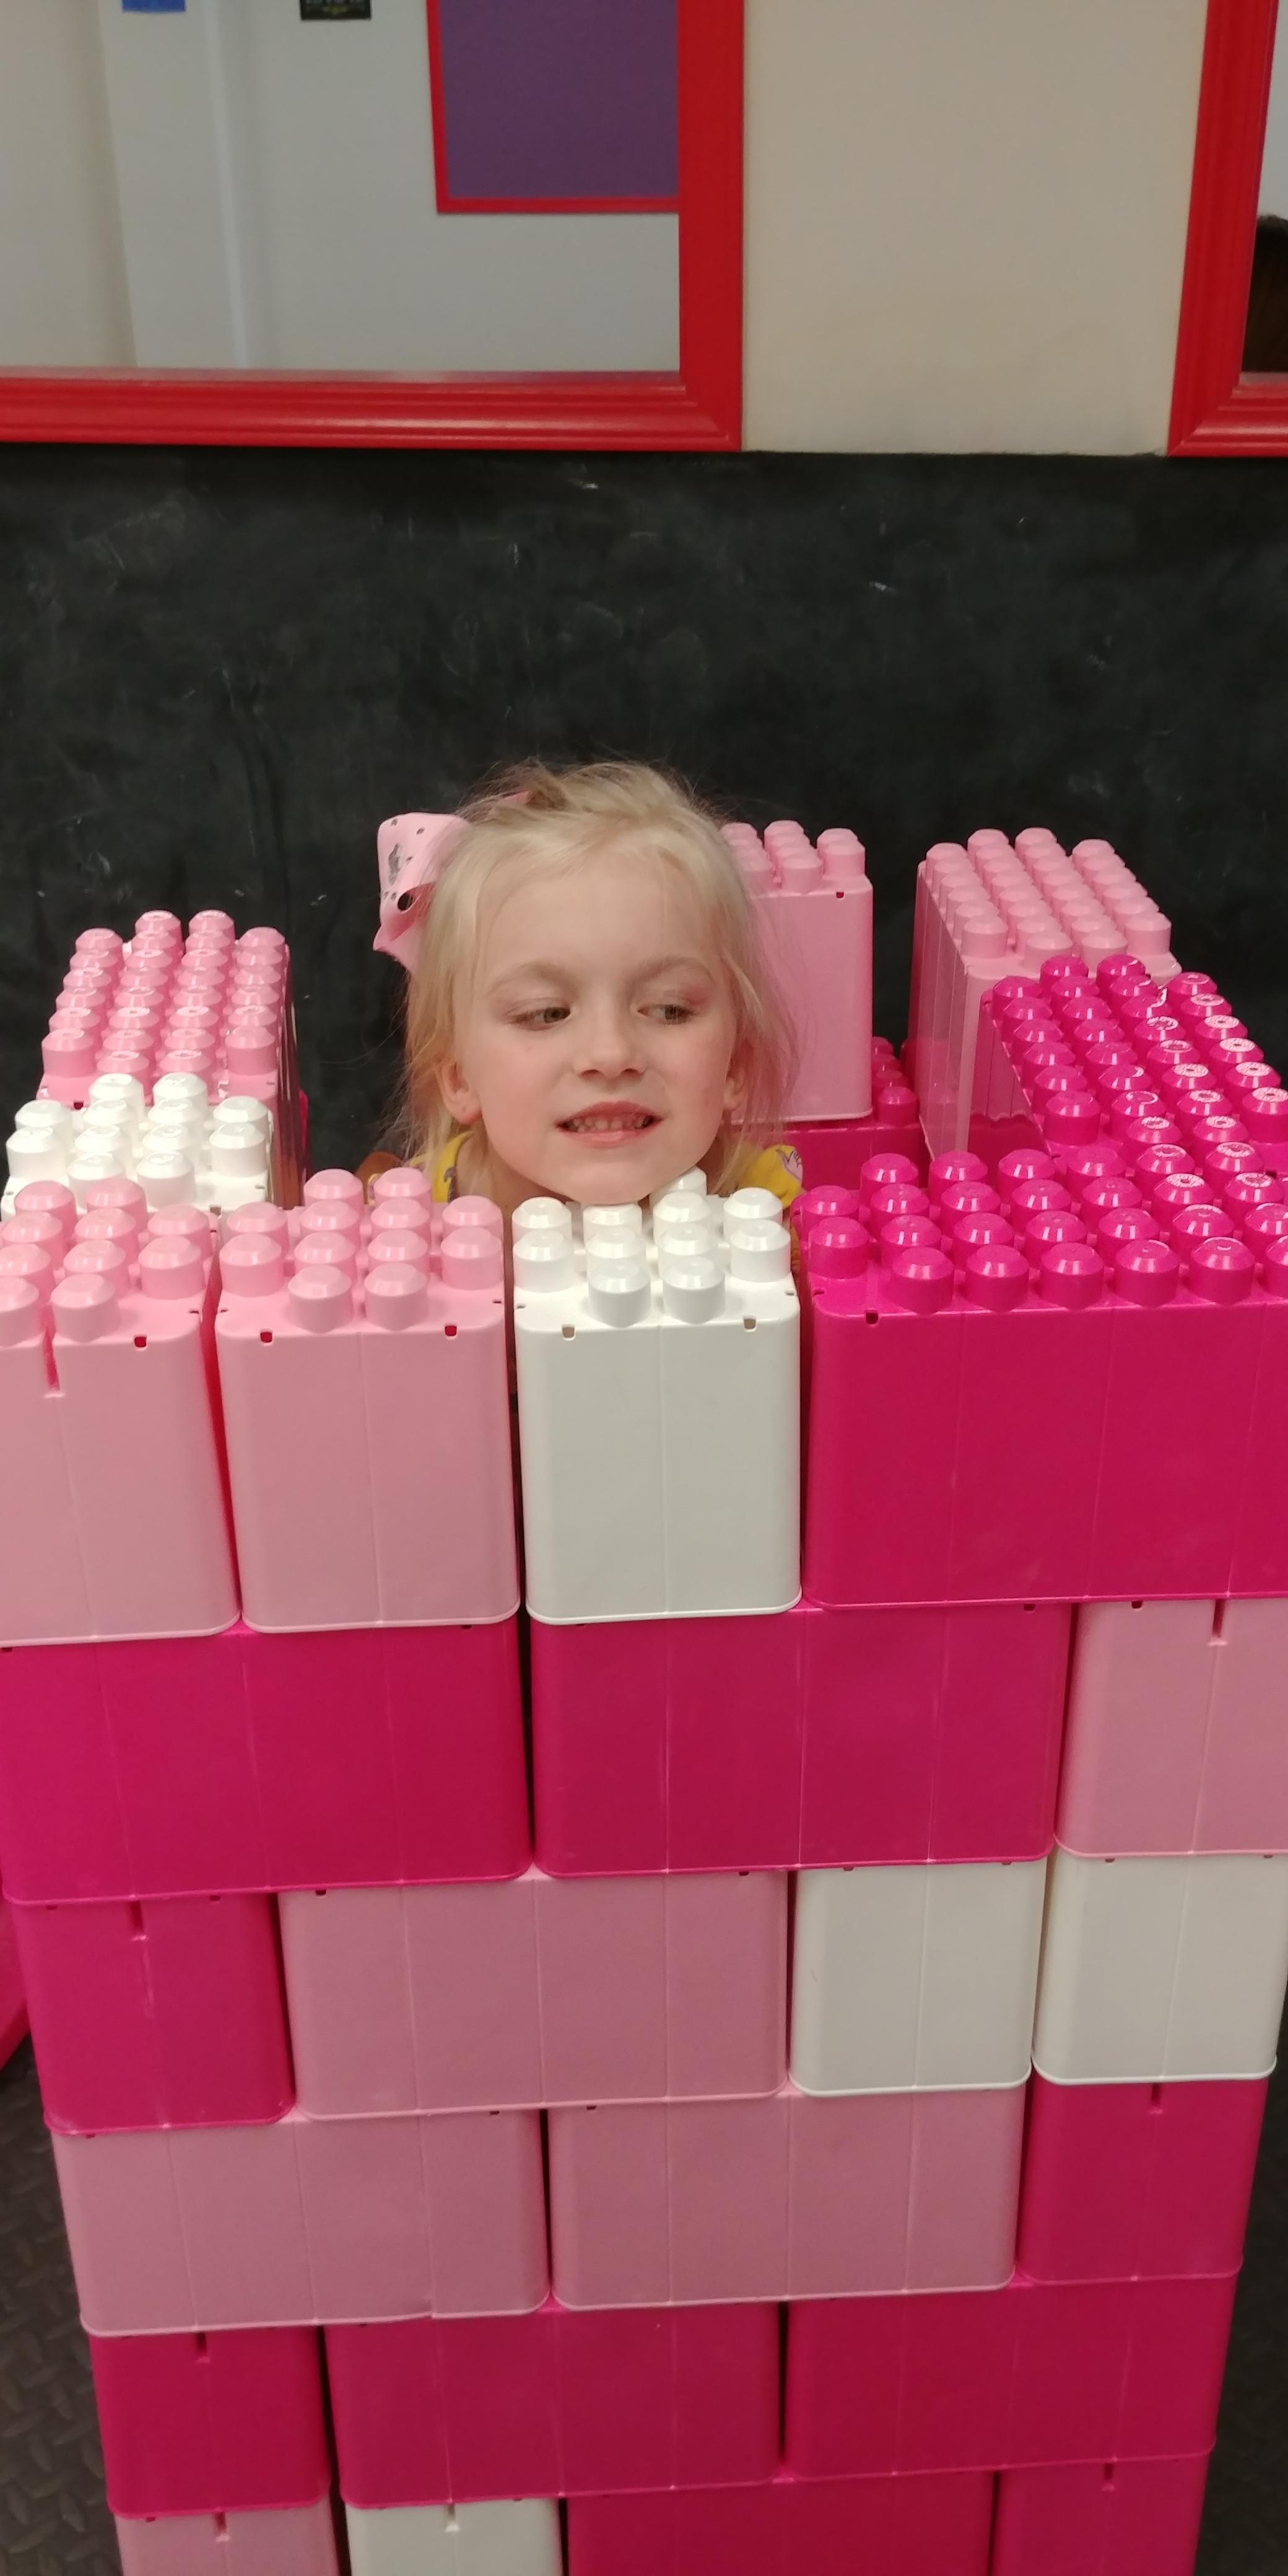 Girl in block tower